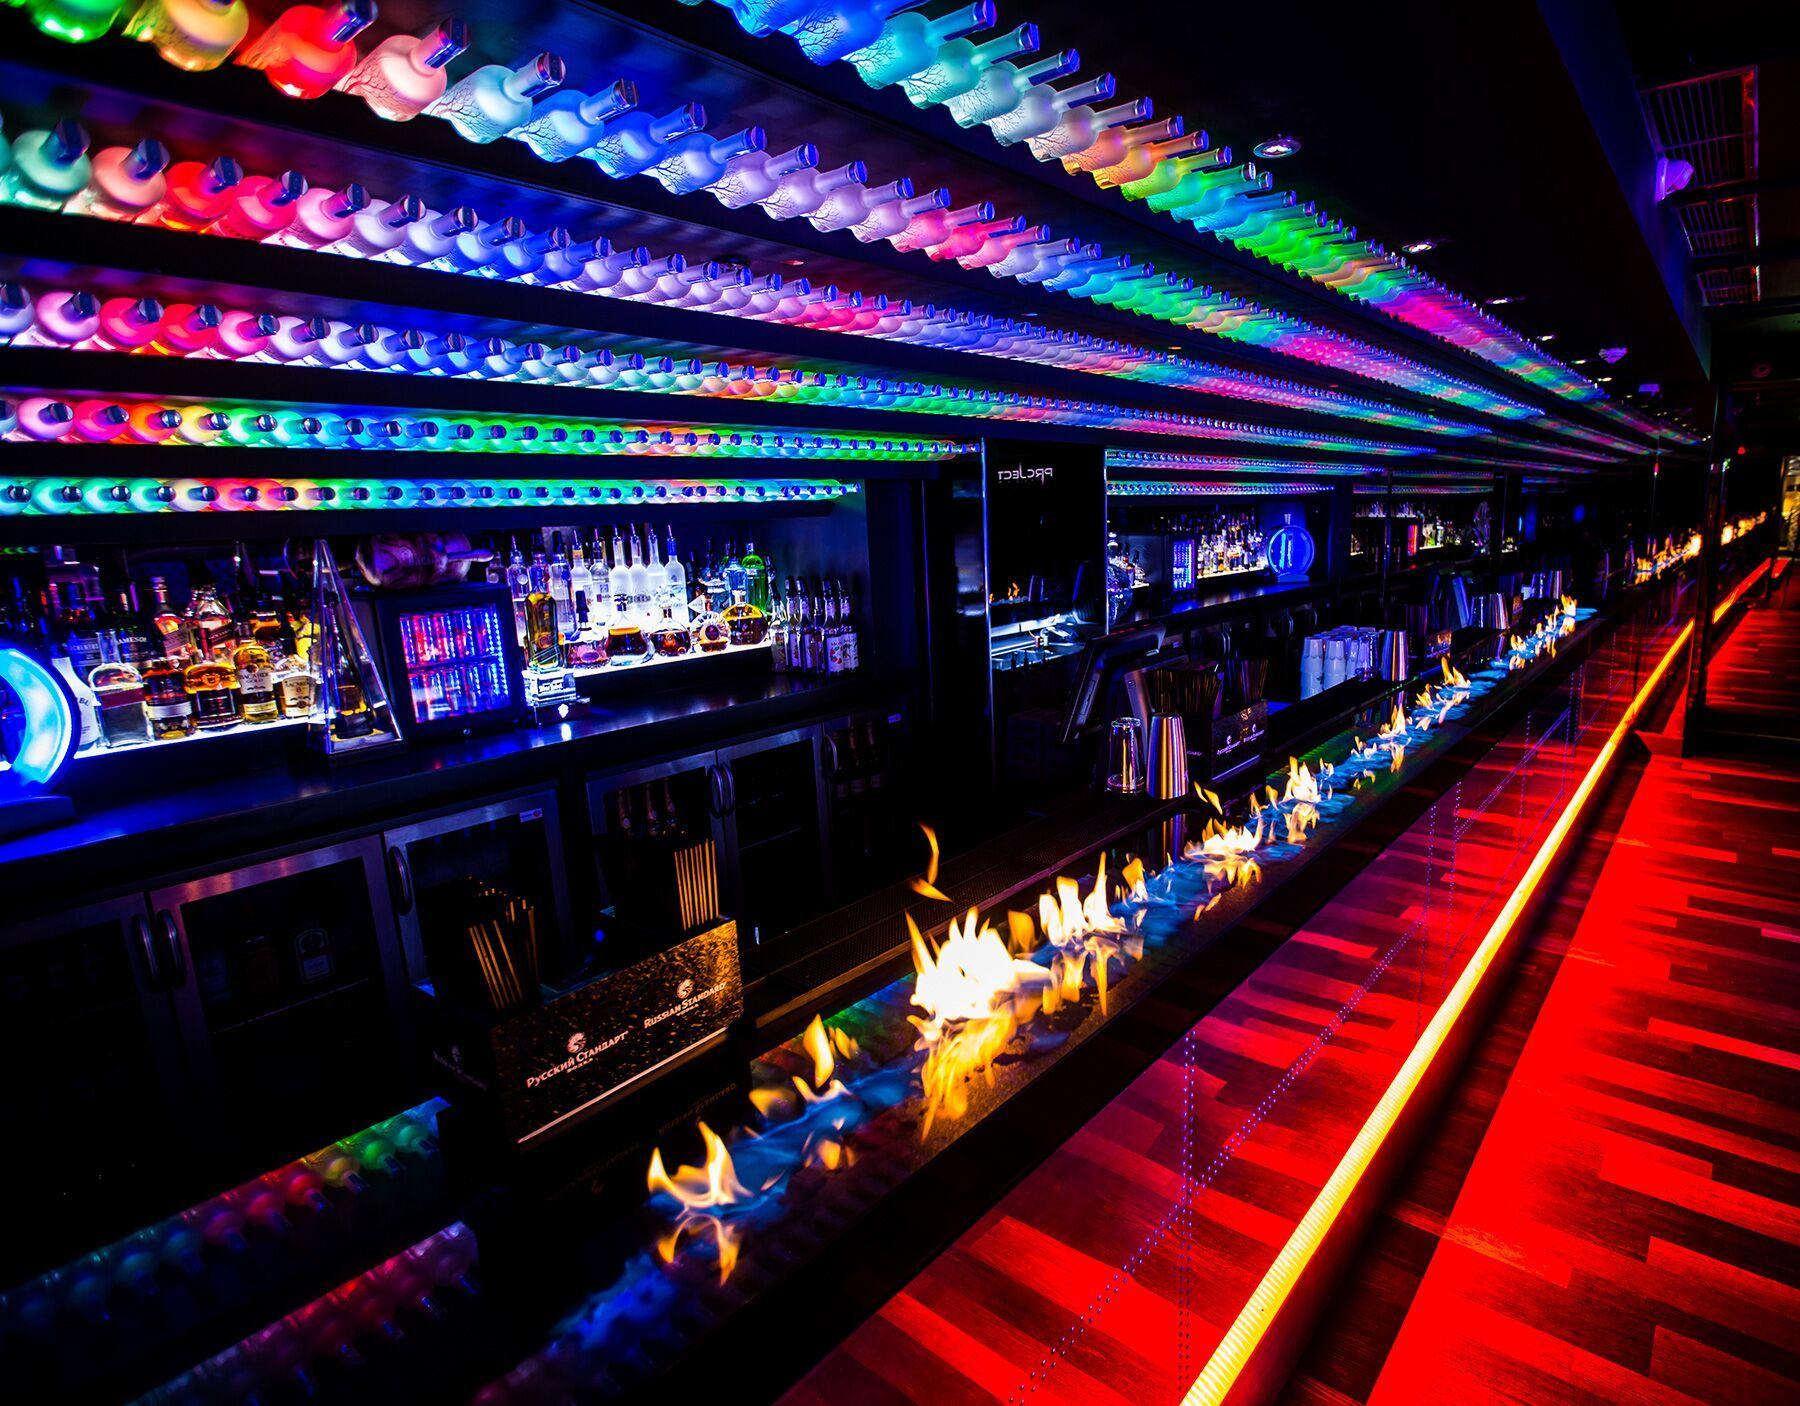 Pixel LED strip www.digitaltape.co.uk